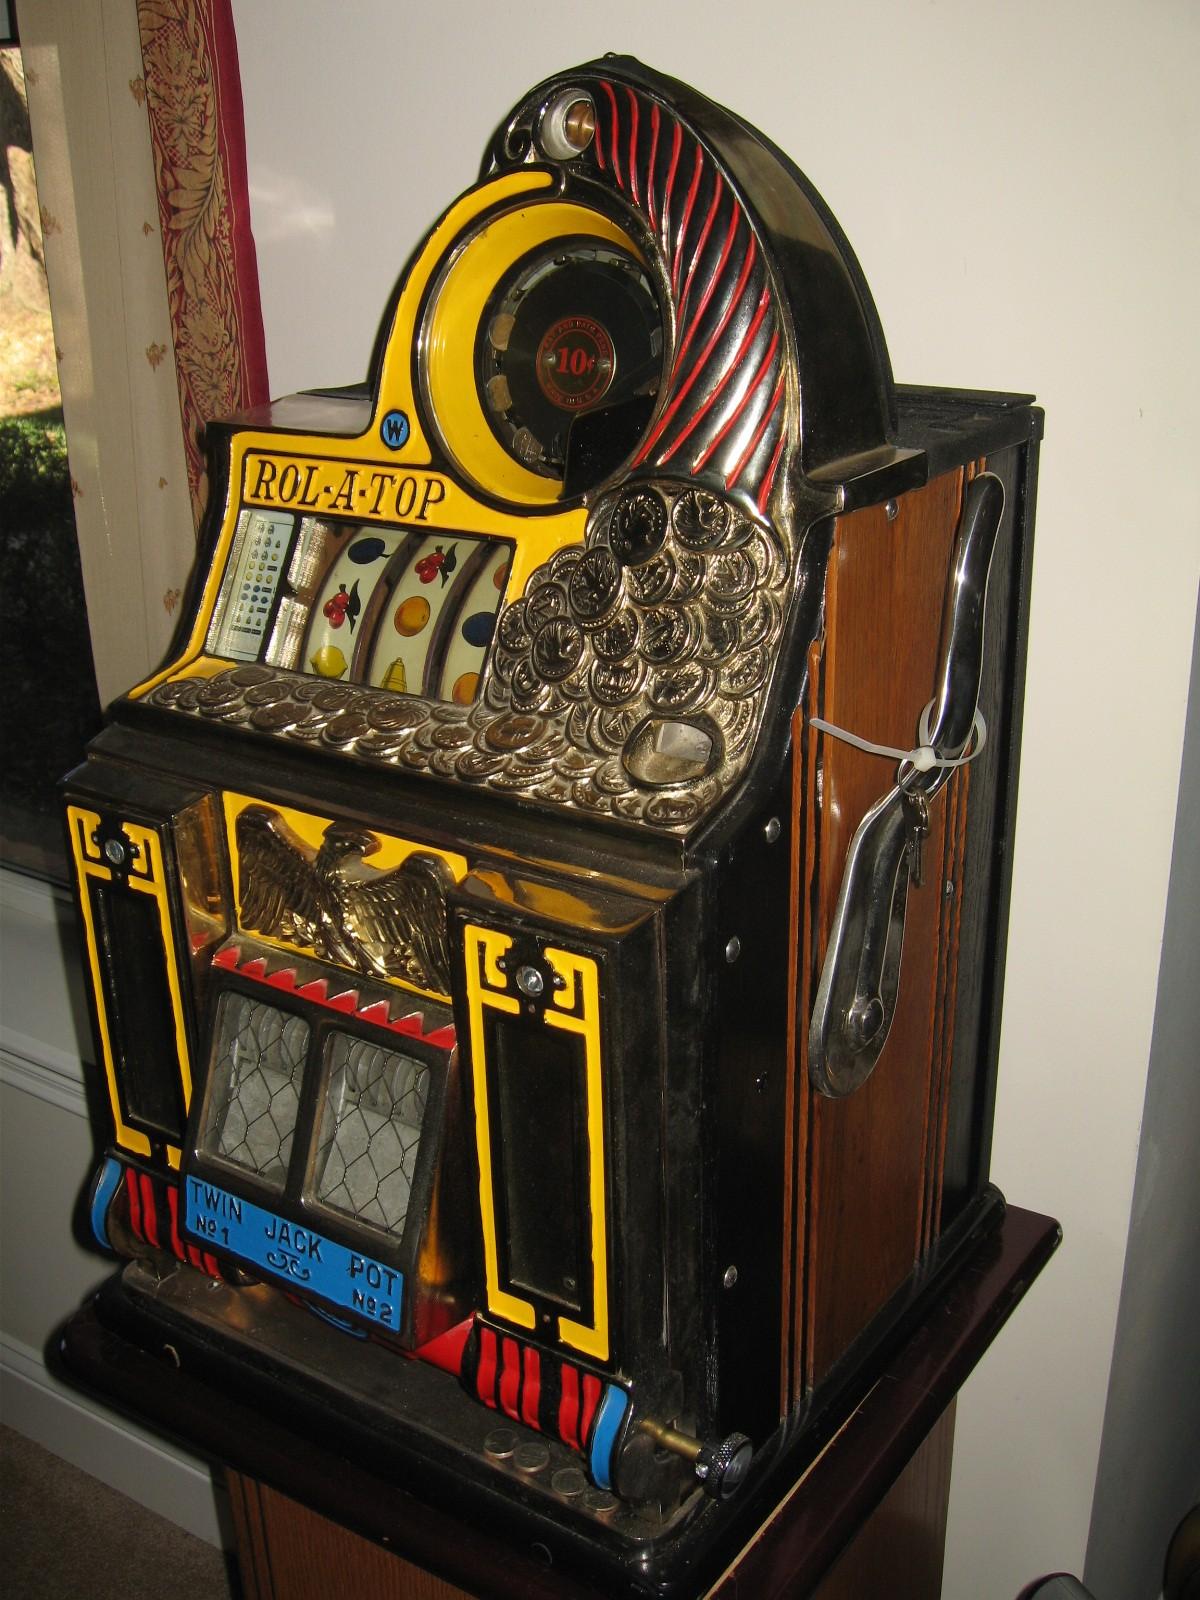 Watling Rol A Top Twin Jackpot Slot Machine With Mint